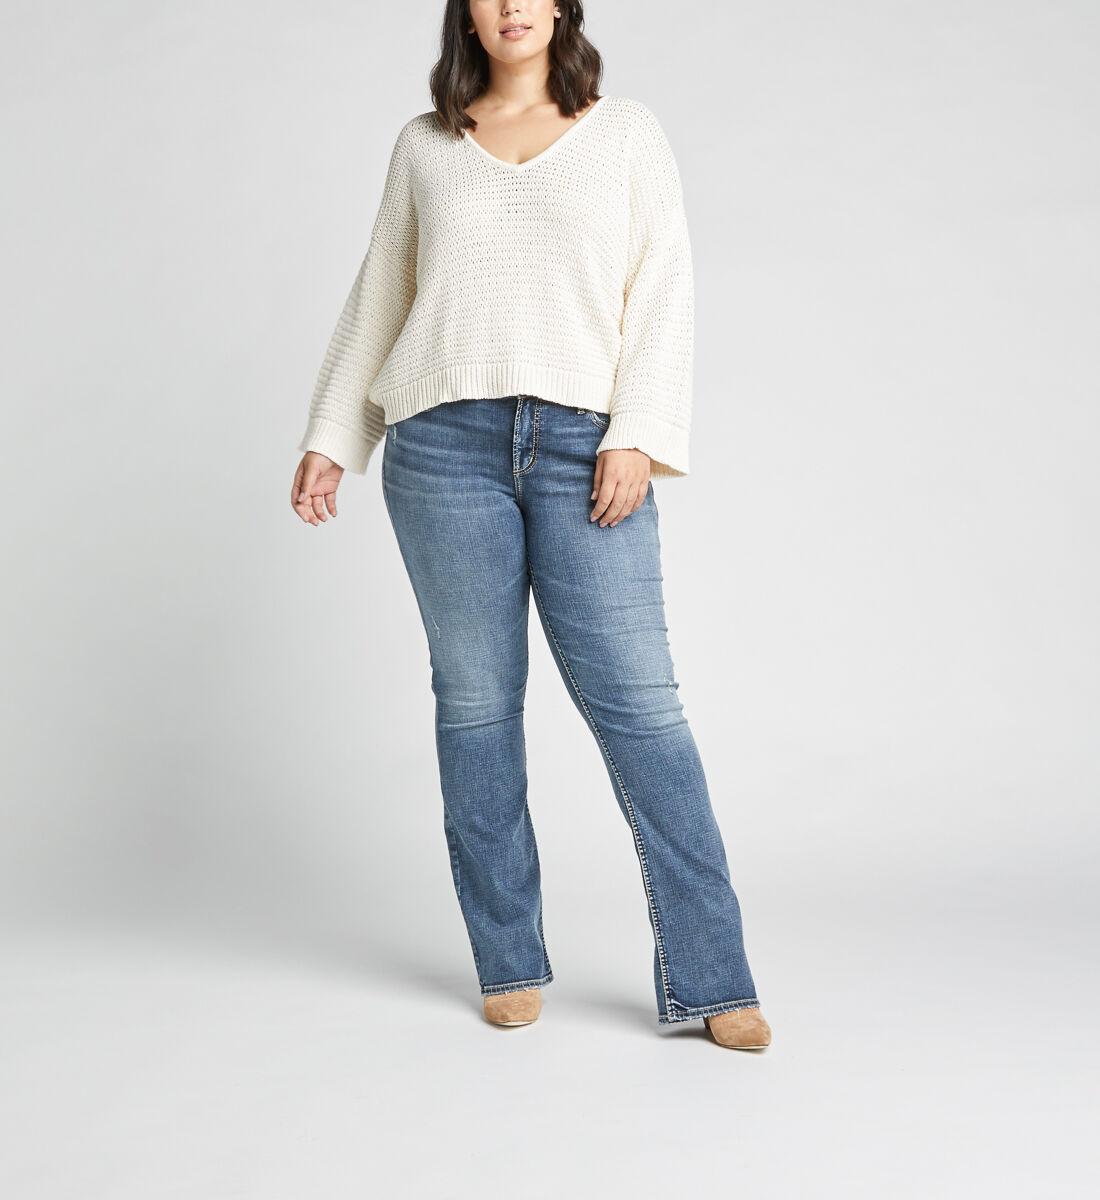 Elyse Mid Rise Slim Bootcut Plus Size Jeans Front